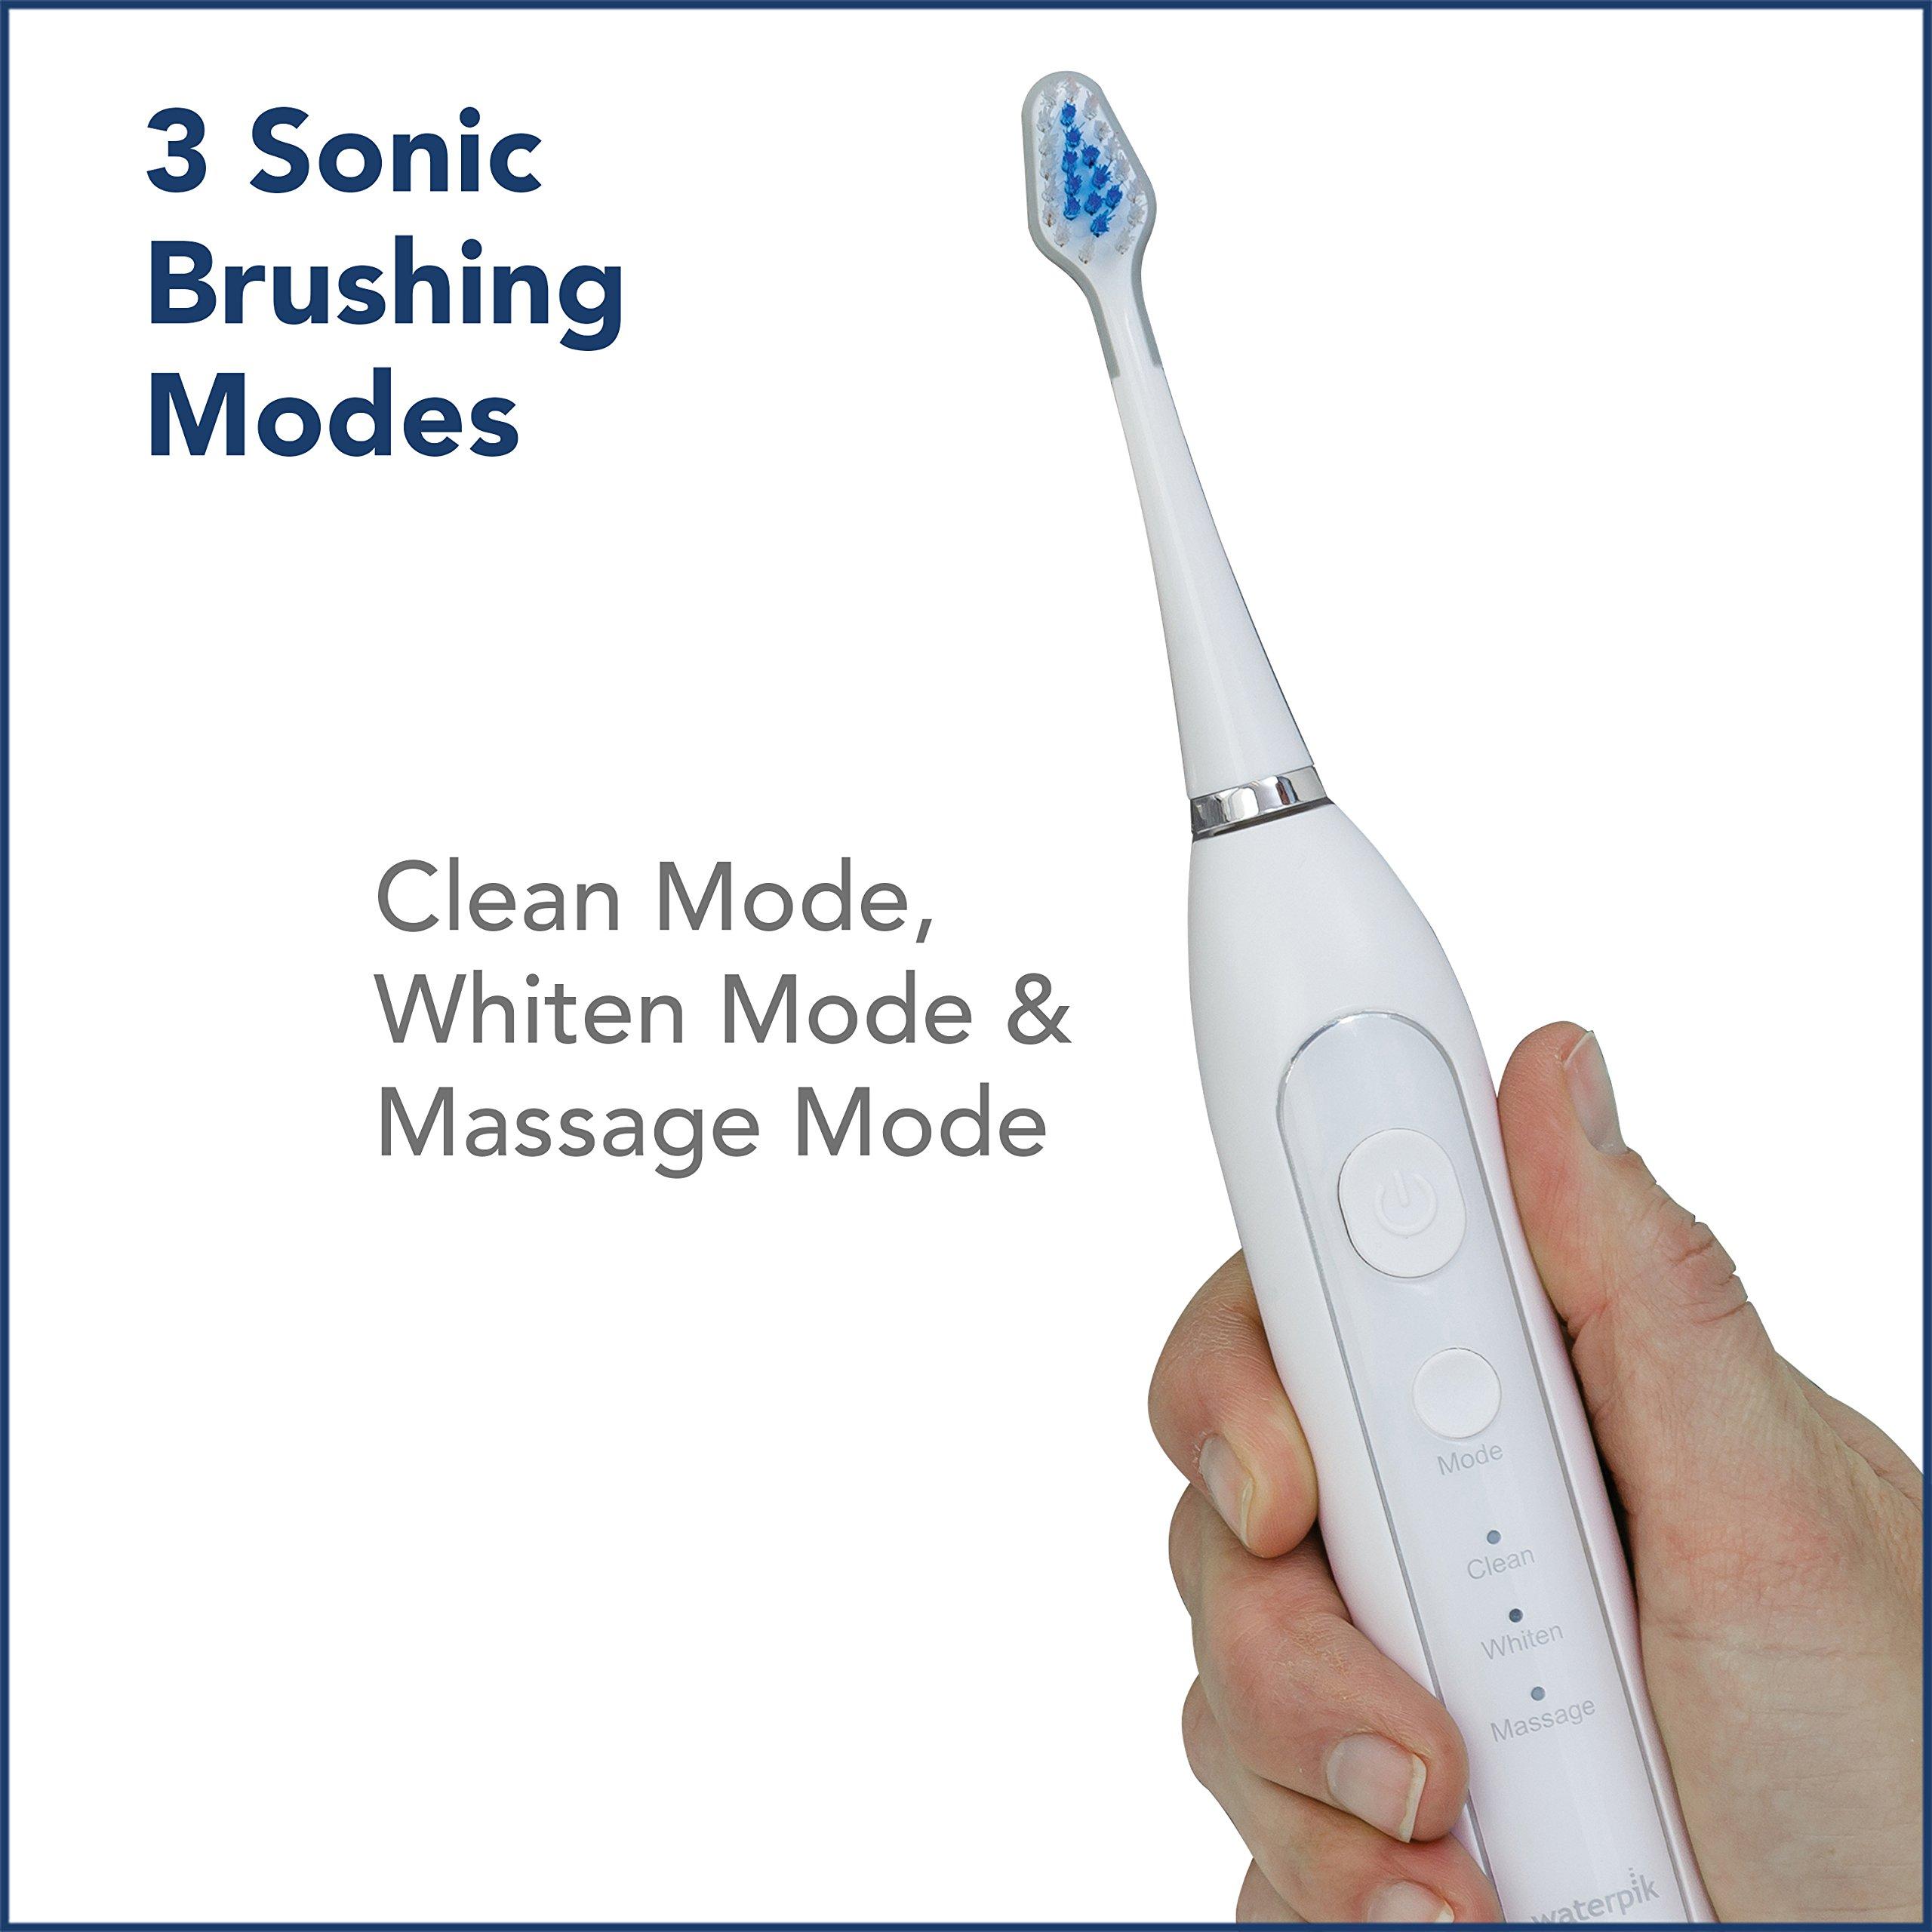 Waterpik Complete Care 9.0 Sonic Electric Toothbrush + Water Flosser, White by Waterpik (Image #8)